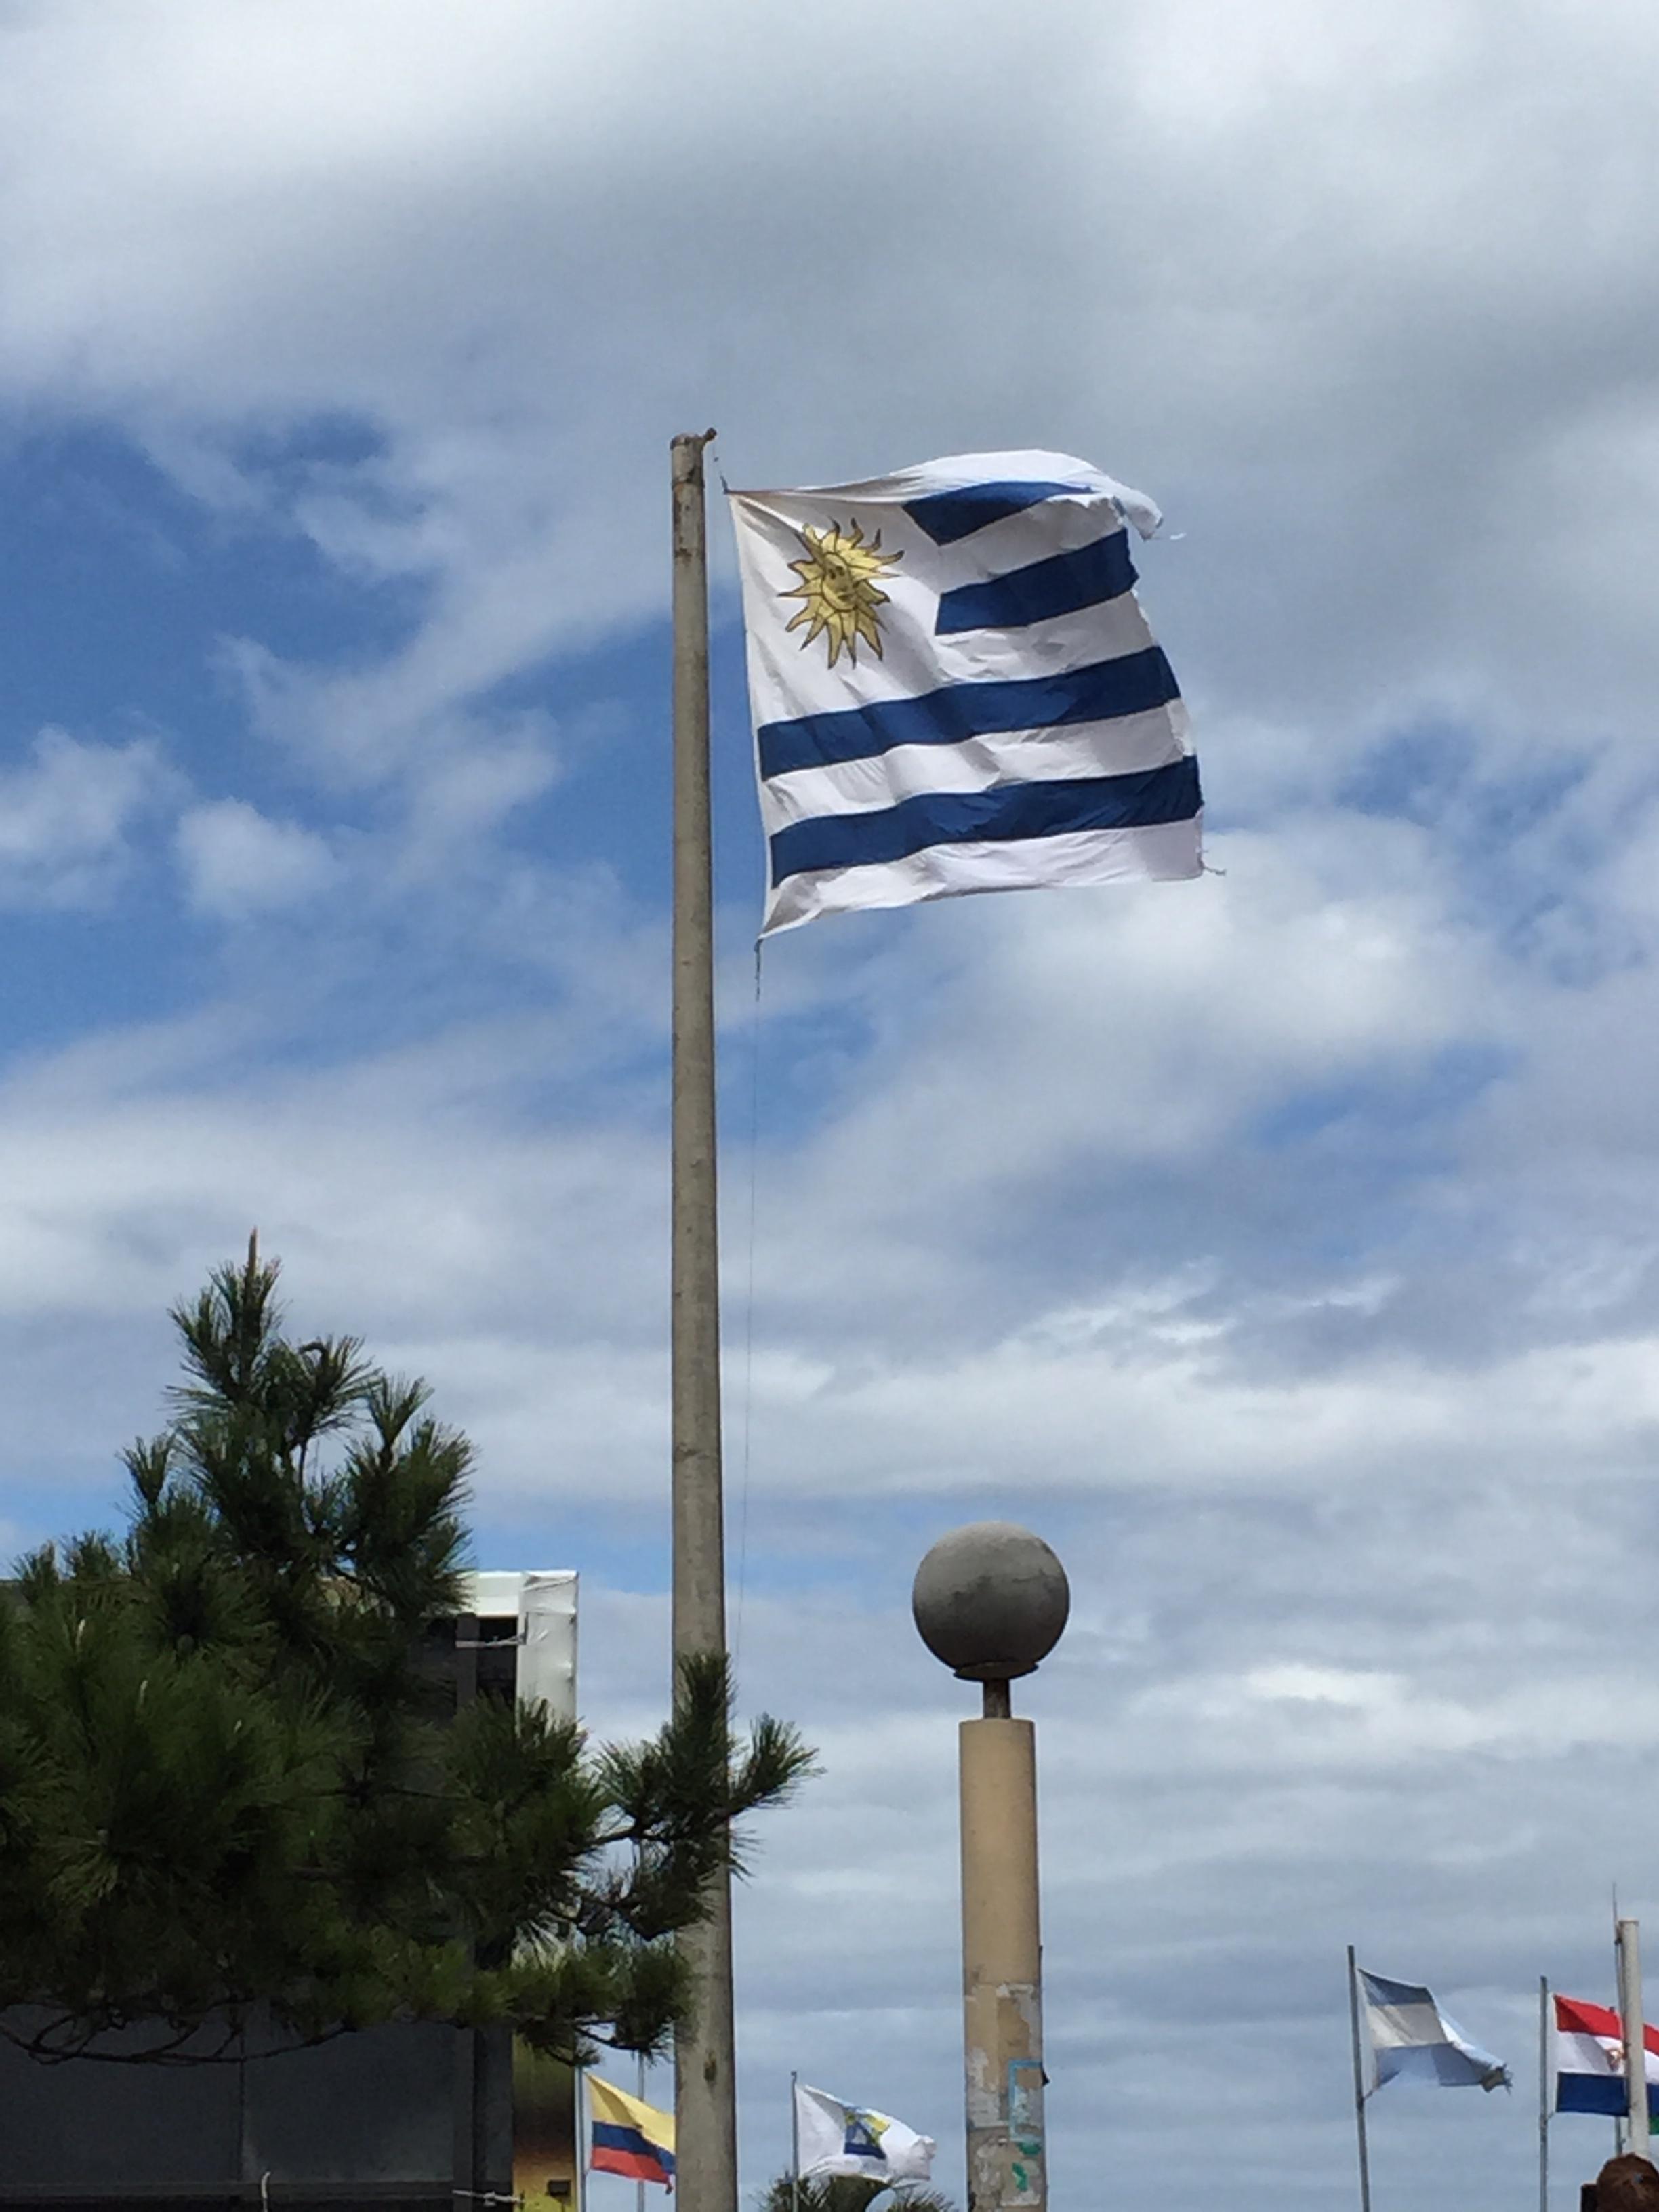 stock-photo-la-bandera-uruguayo-104136065.jpg